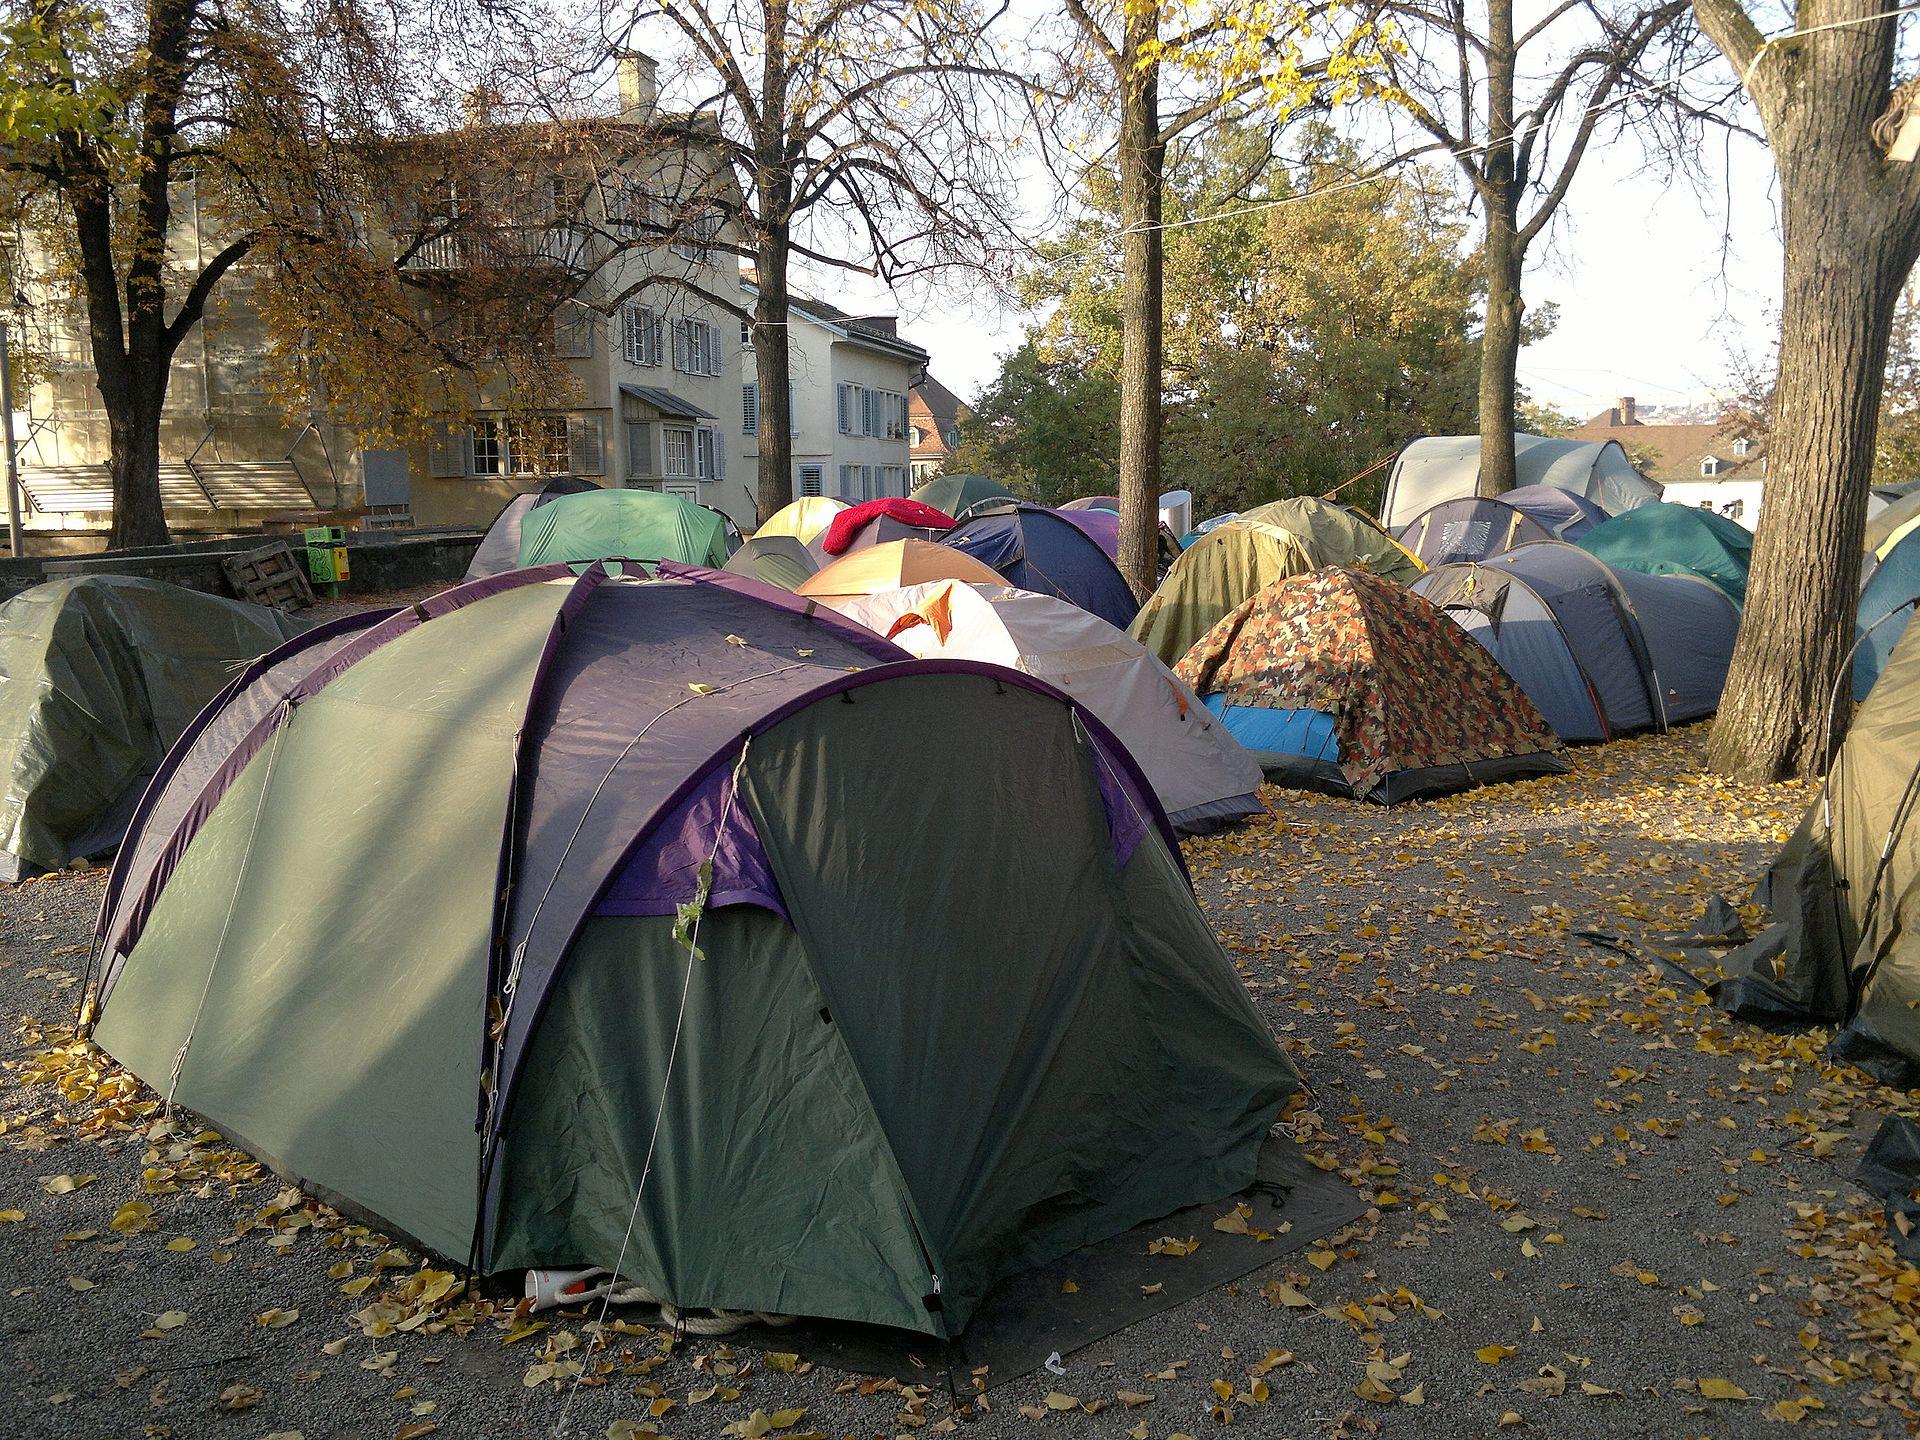 Tenda Wiktionary